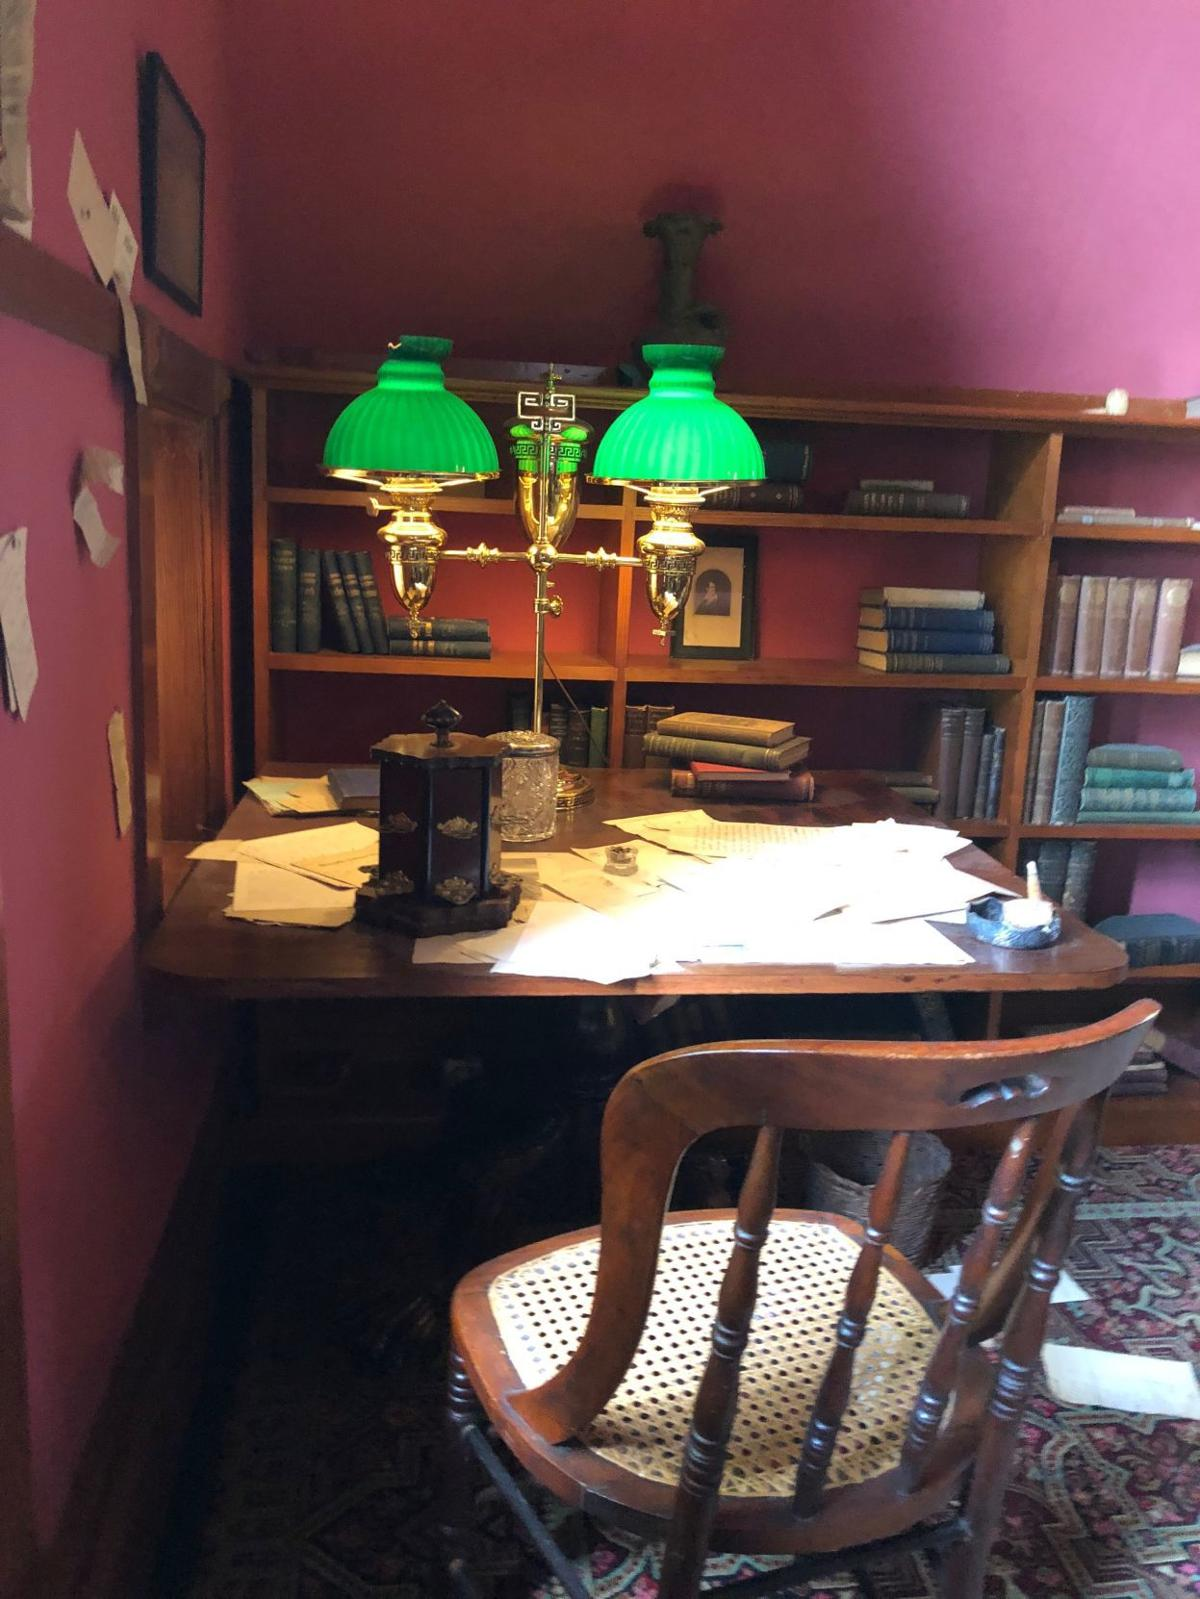 Mark Twain's writing desk